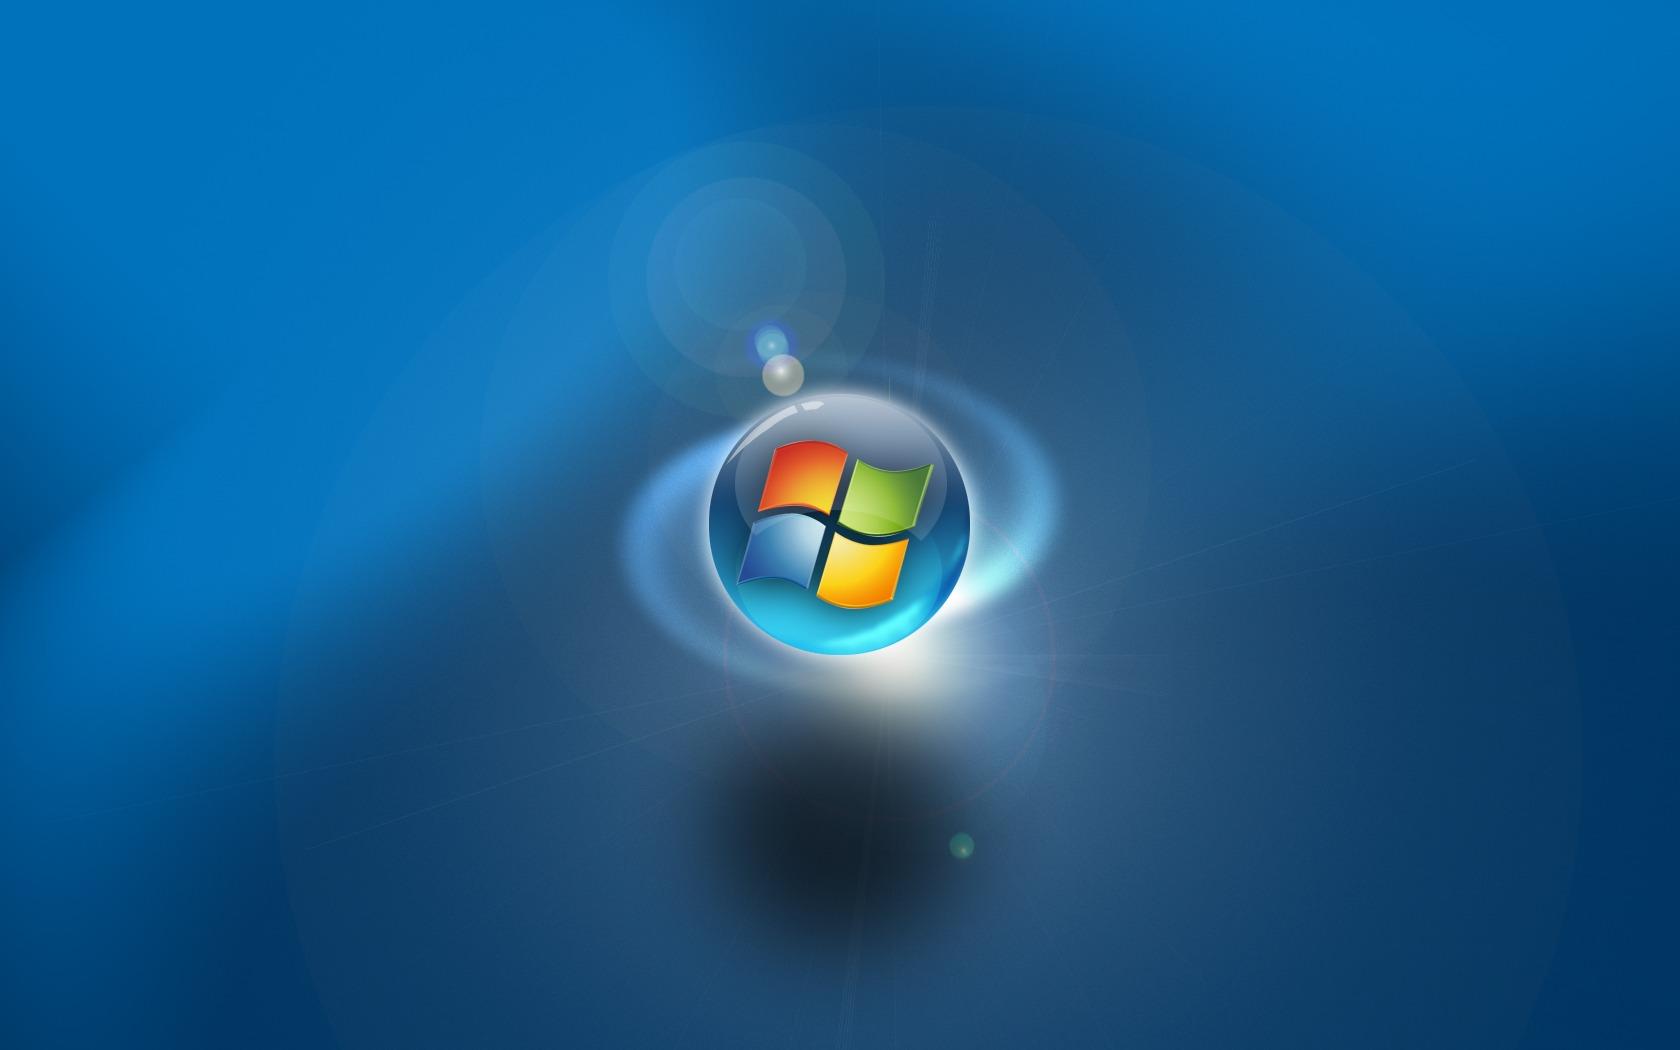 vista logo wallpaper windows vista computers wallpapers in jpg